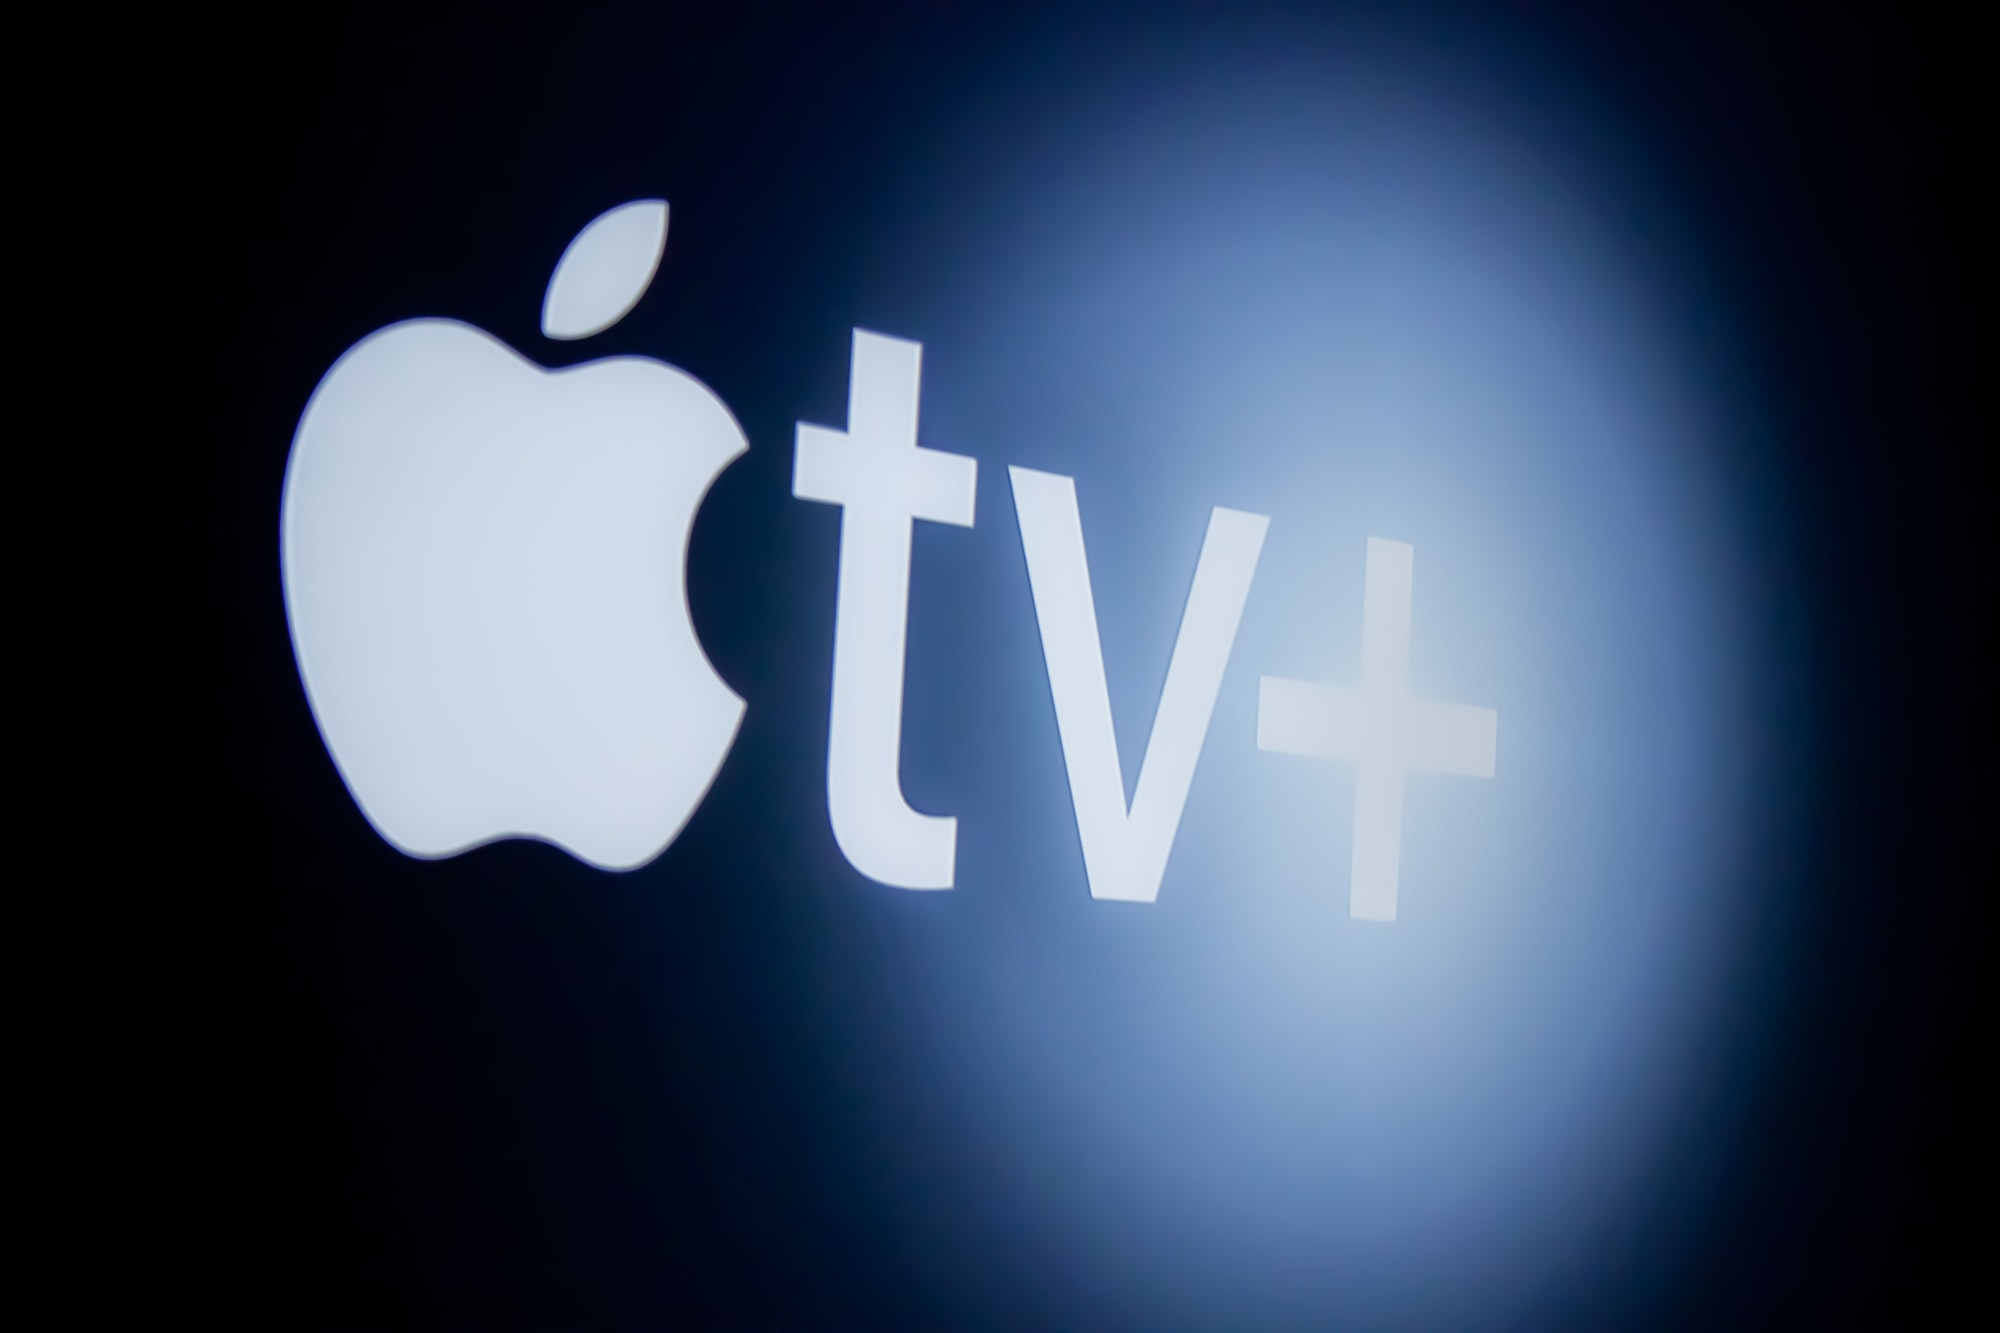 Apple tv+ intro screen.